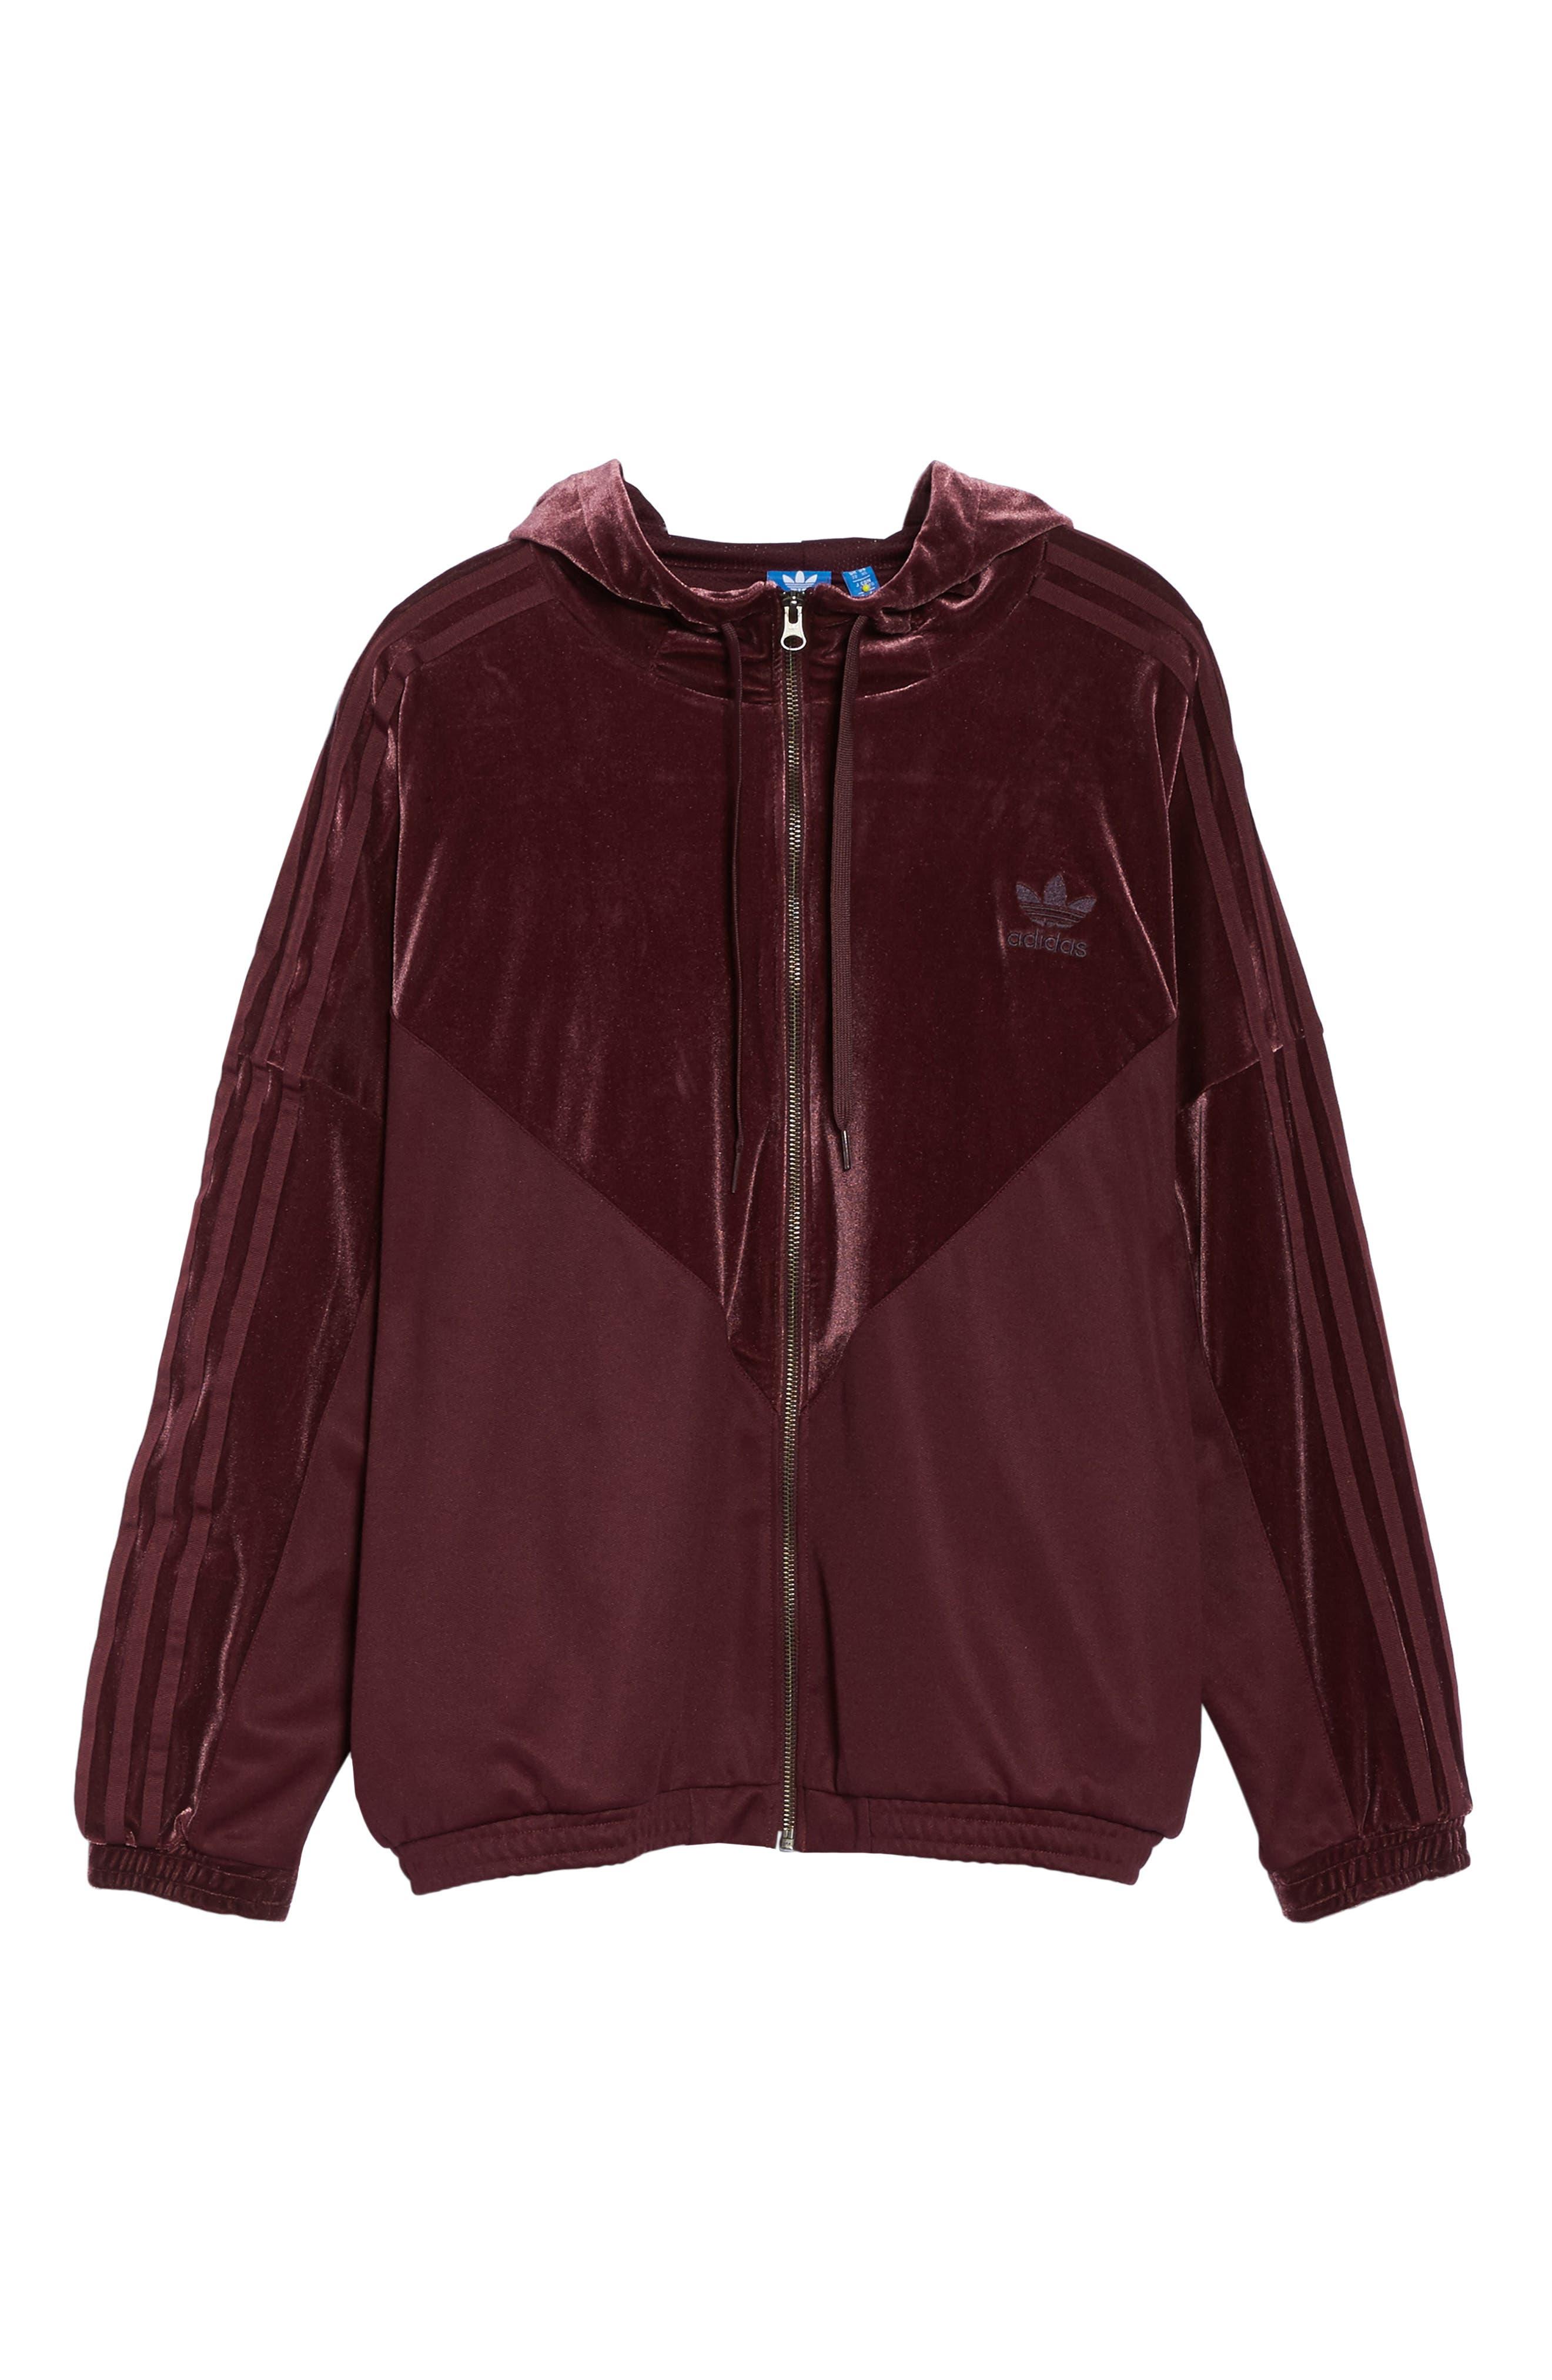 Velvet Zip Sweatshirt,                             Alternate thumbnail 7, color,                             Maroon